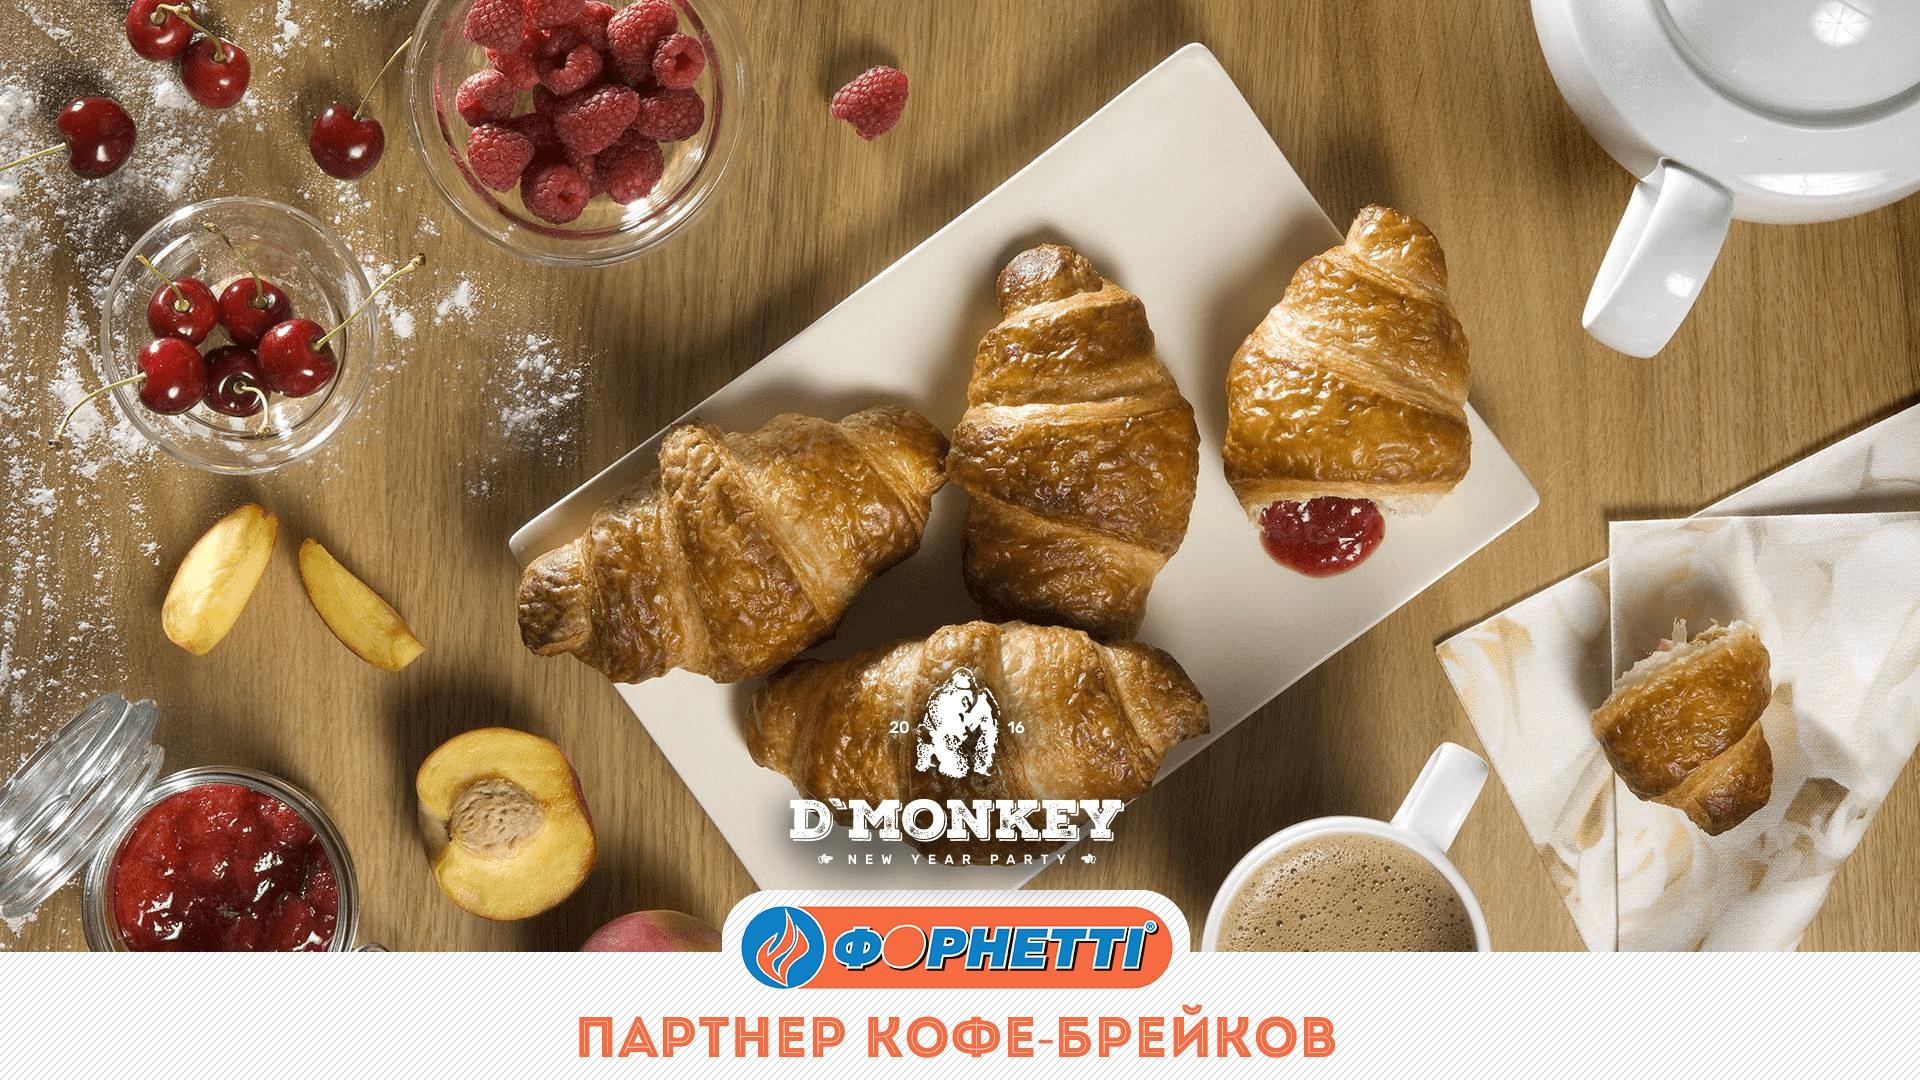 «Форнетти» – партнер кофе-брейков на конференции Digital Monkey